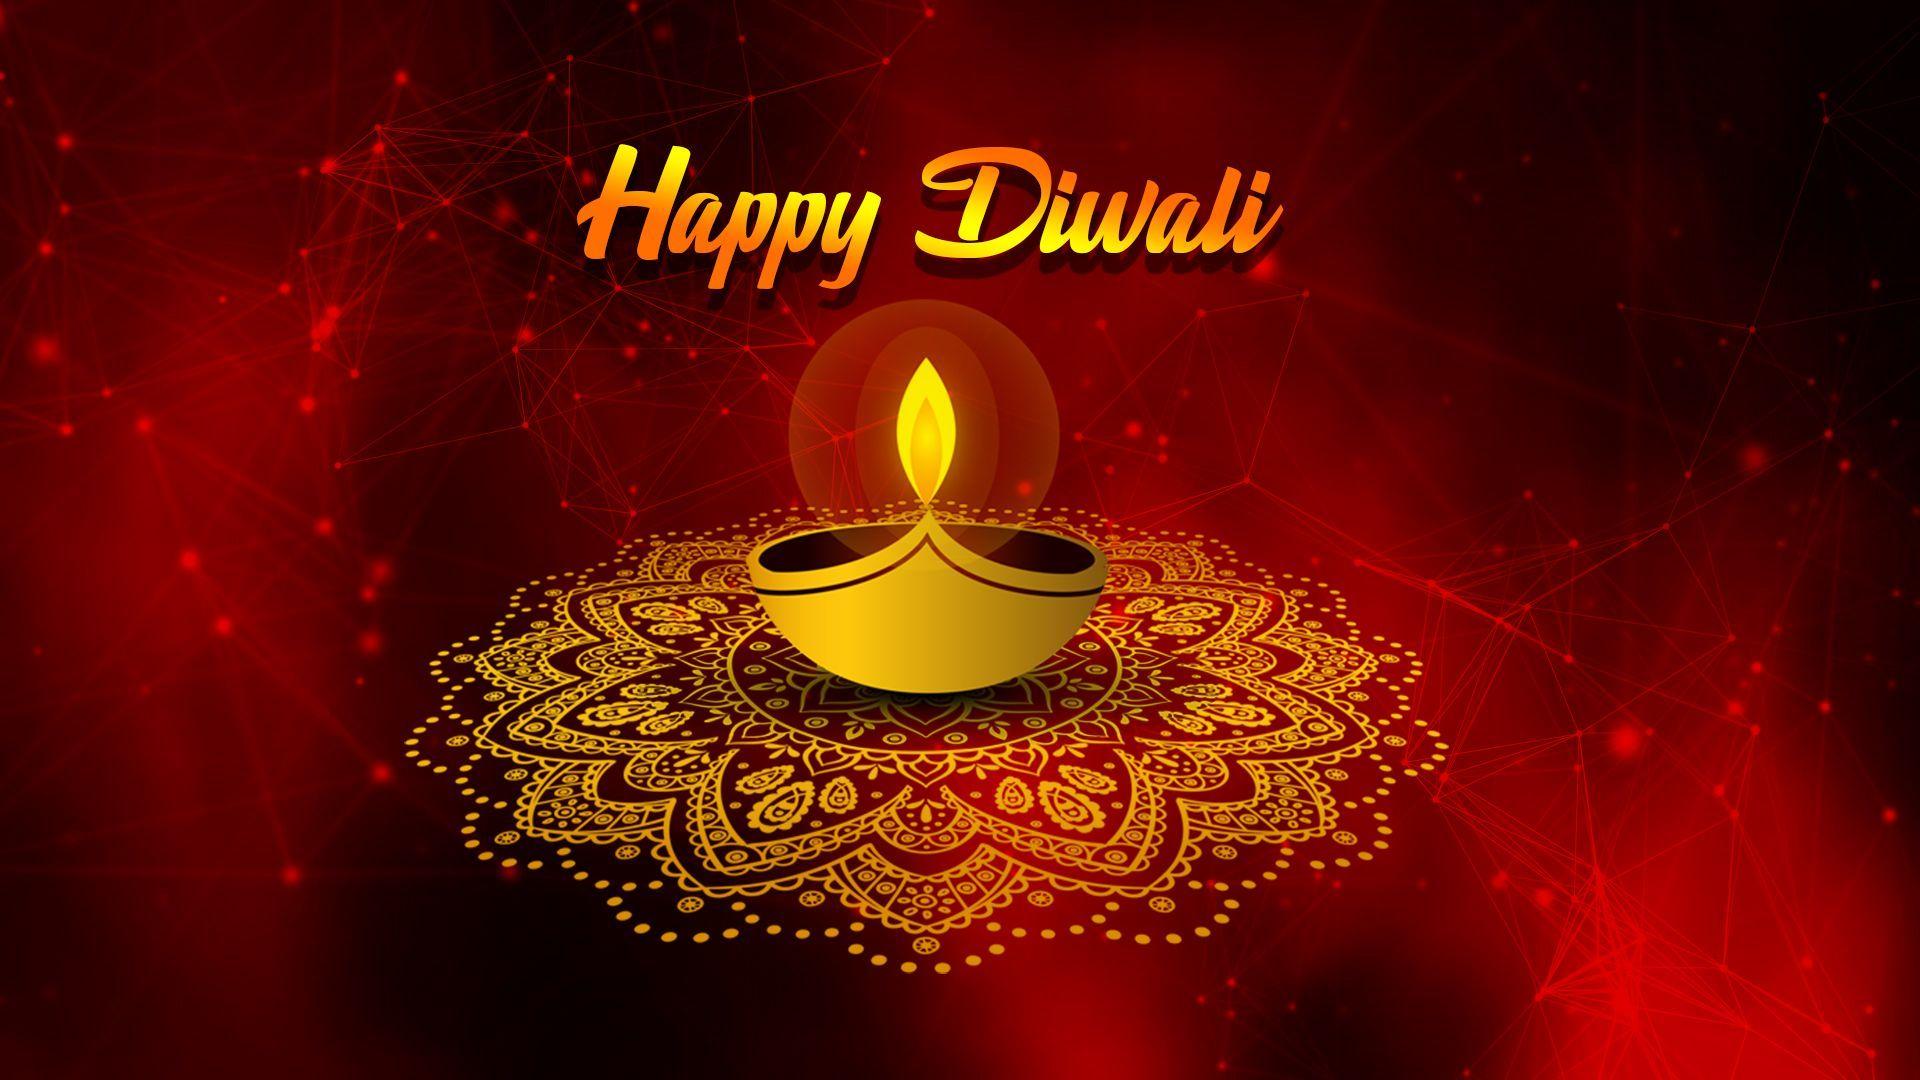 Festival of Light | Happy Diwali 2020 in 2020 | Happy diwali, Festival lights, Diwali wishes